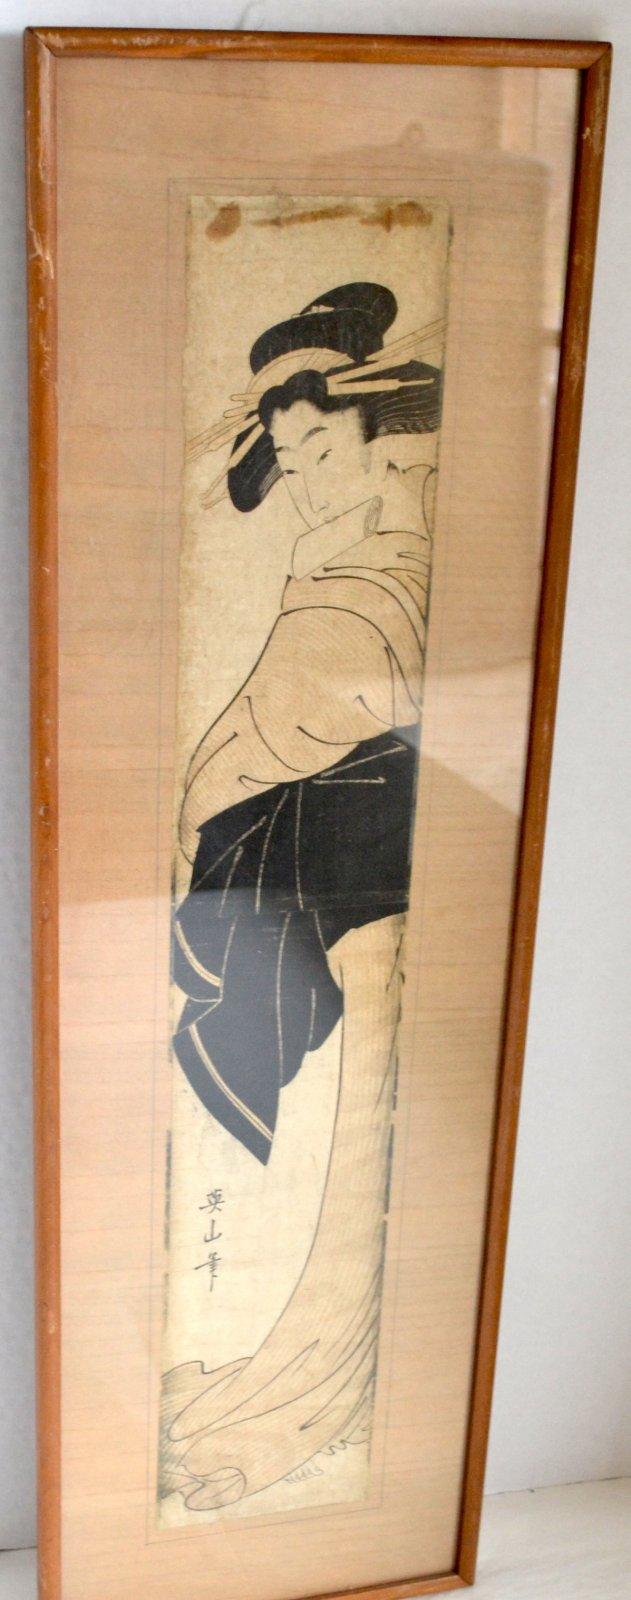 Japanese Wood Block Print of a Geisha